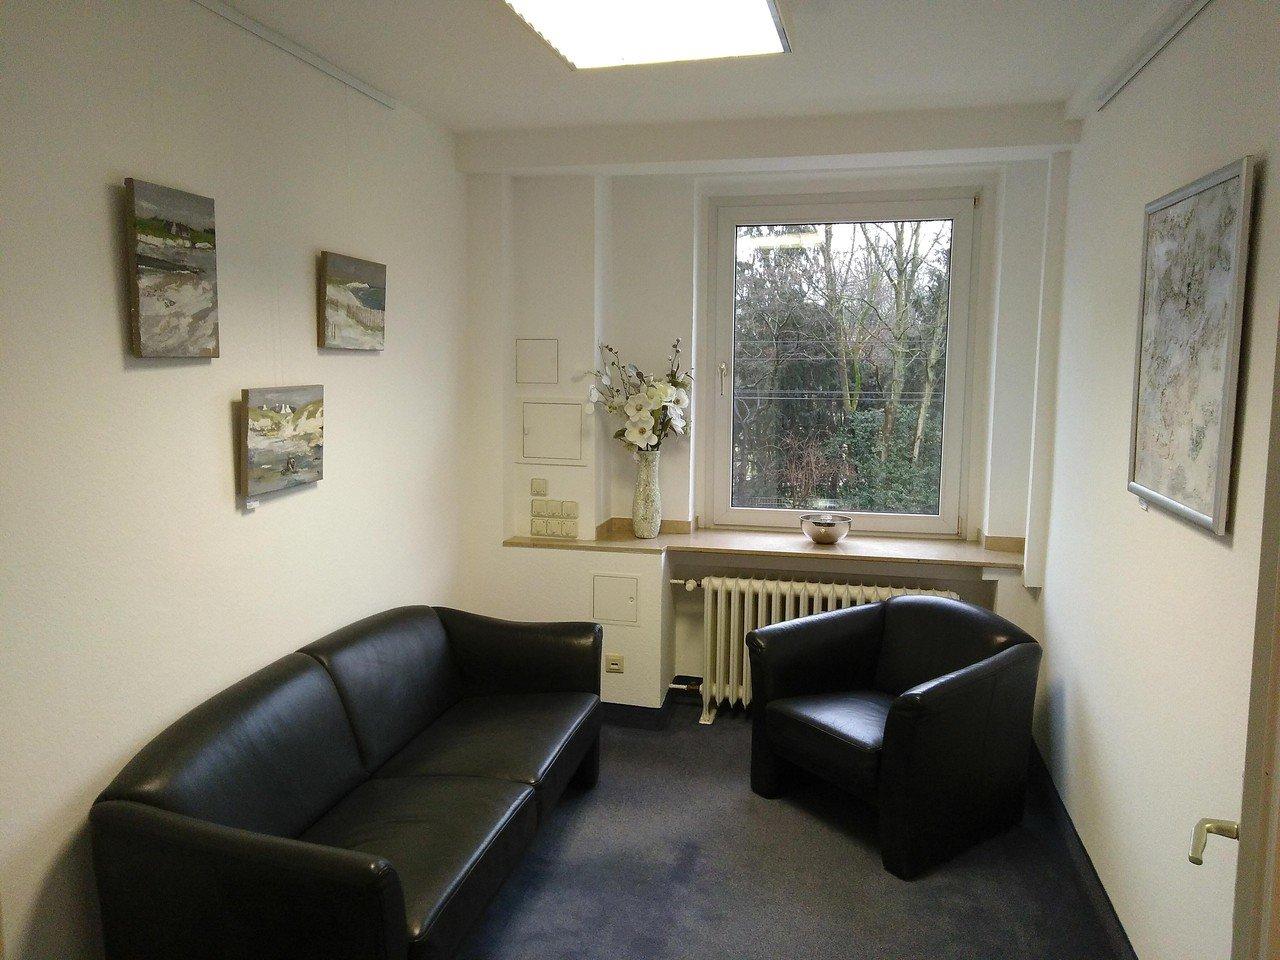 Düsseldorf Trainingsräume Salle de réunion Room Lore image 2